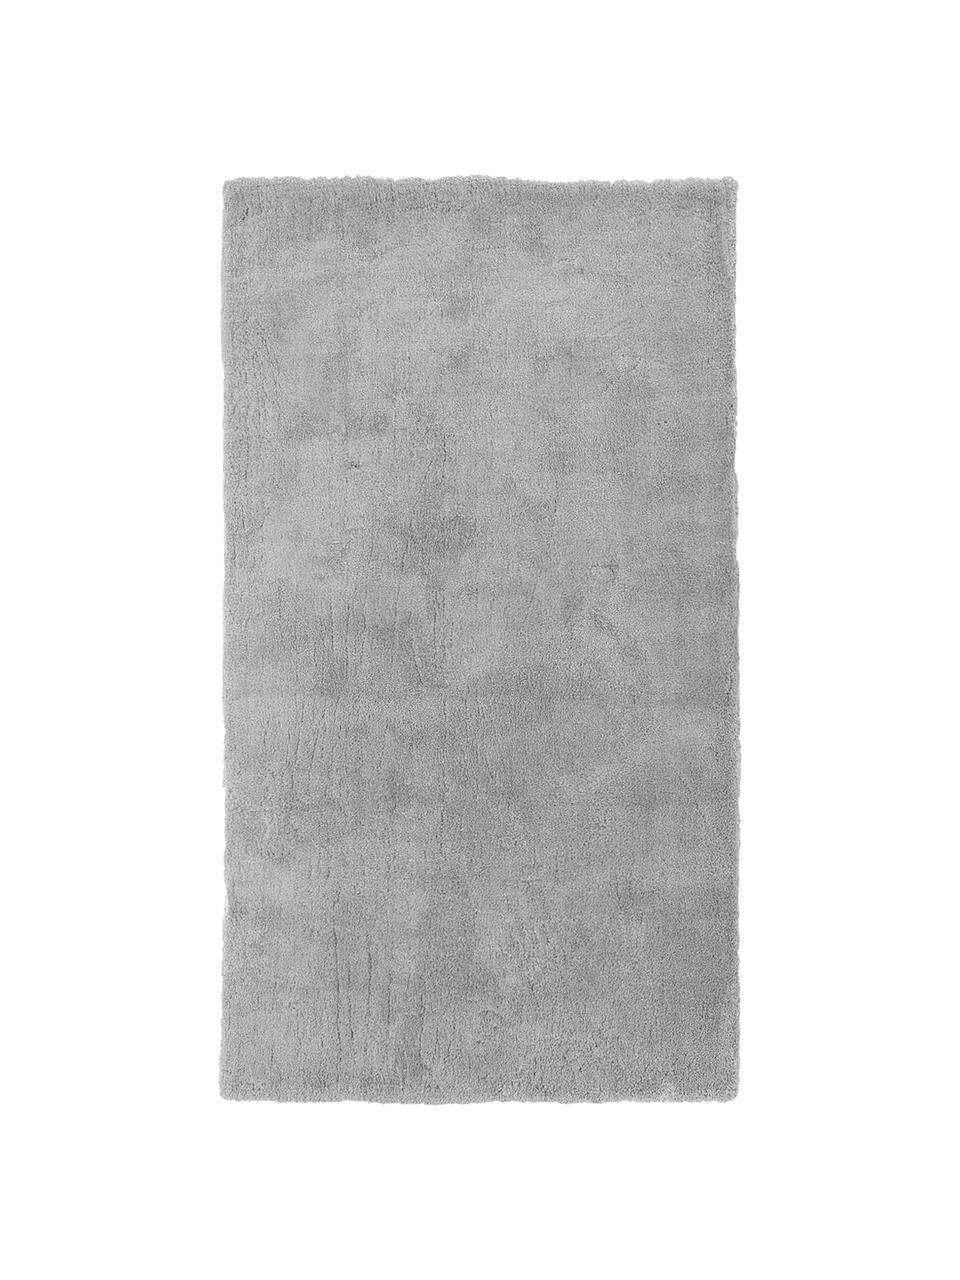 Flauschiger Hochflor-Teppich Leighton in Grau, Flor: 100% Polyester (Mikrofase, Grau, B 80 x L 150 cm (Größe XS)